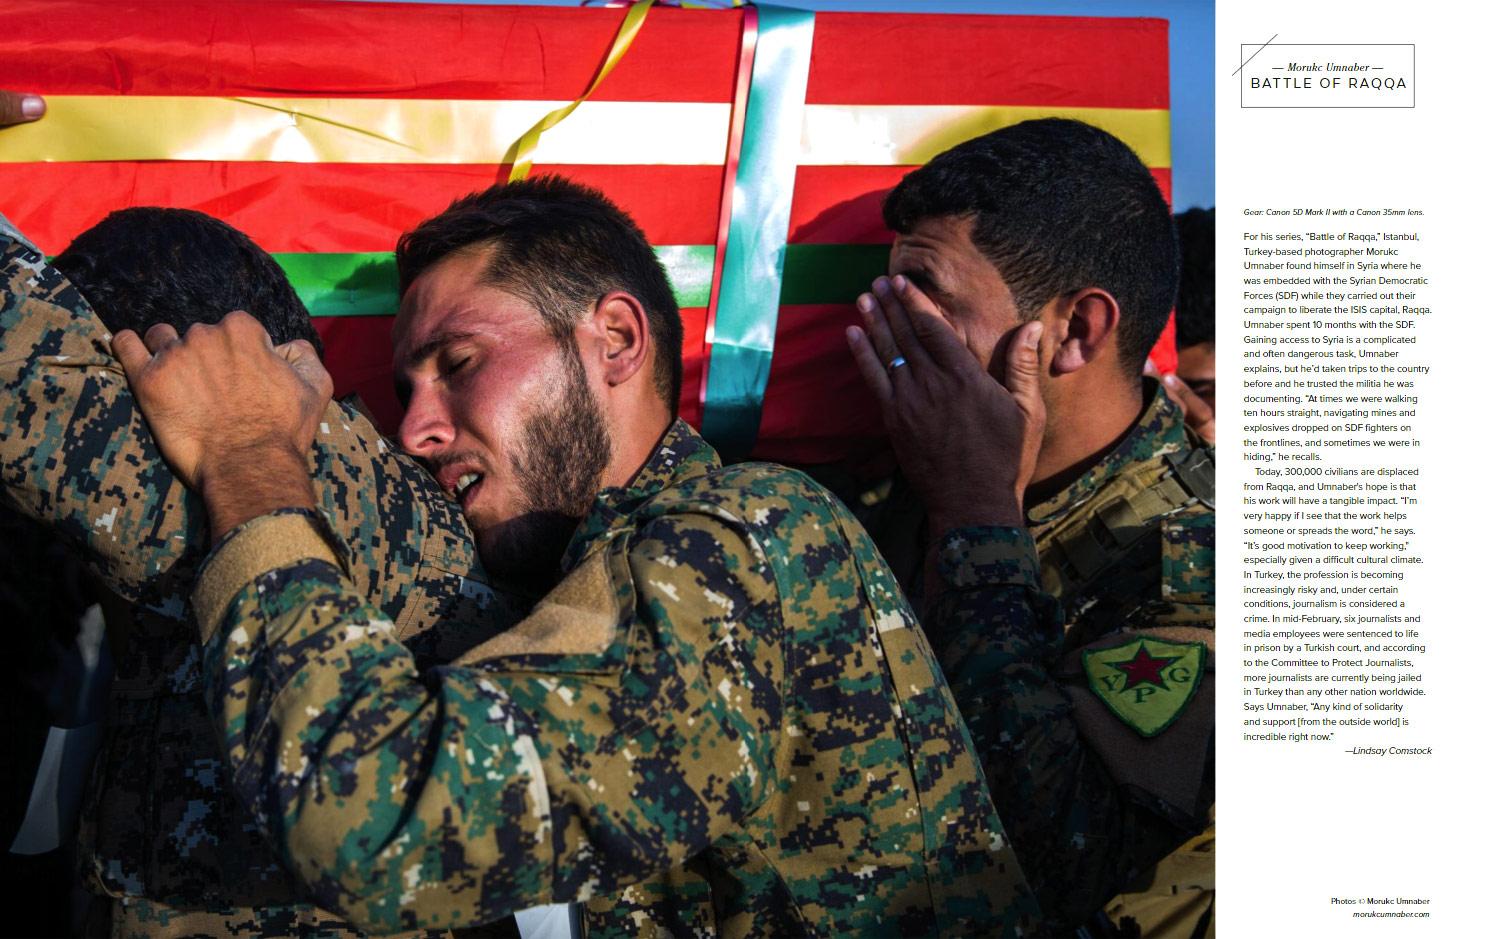 Битва за Ракку, © Морук Умнабер / Morukc Umnaber, Фотоконкурс «Новый фотограф» / Emerging Photographer